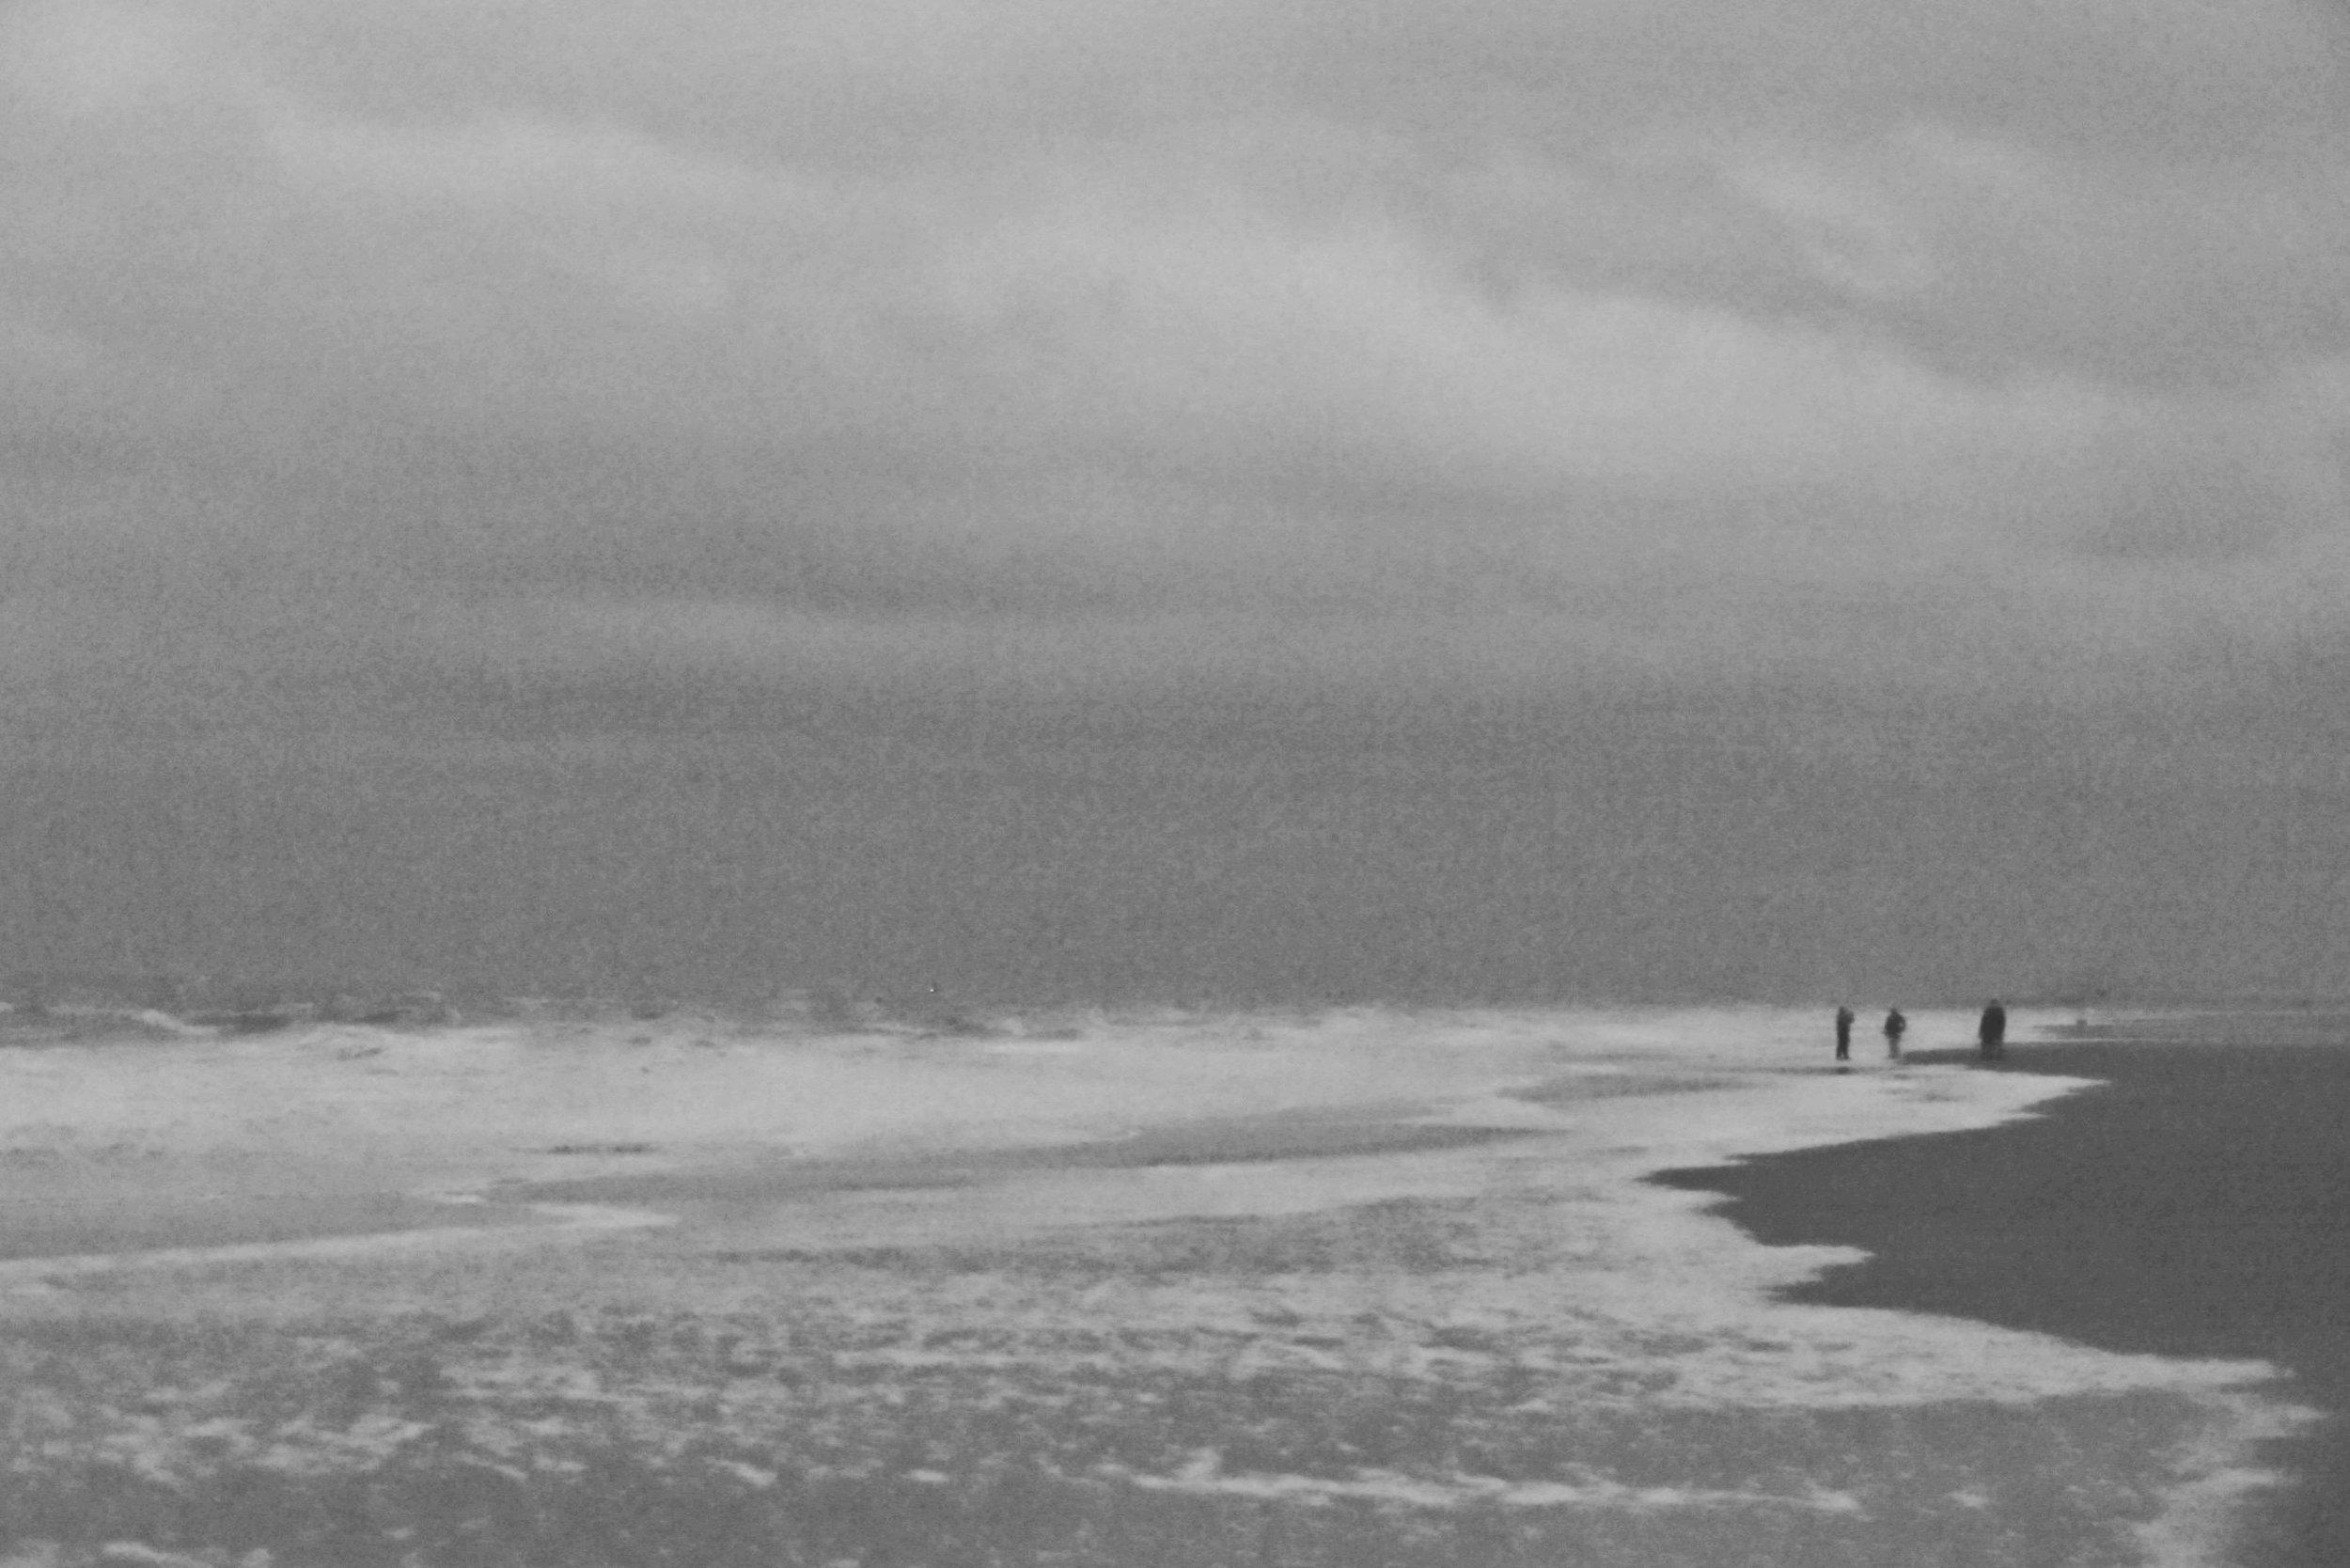 Foggy beach day